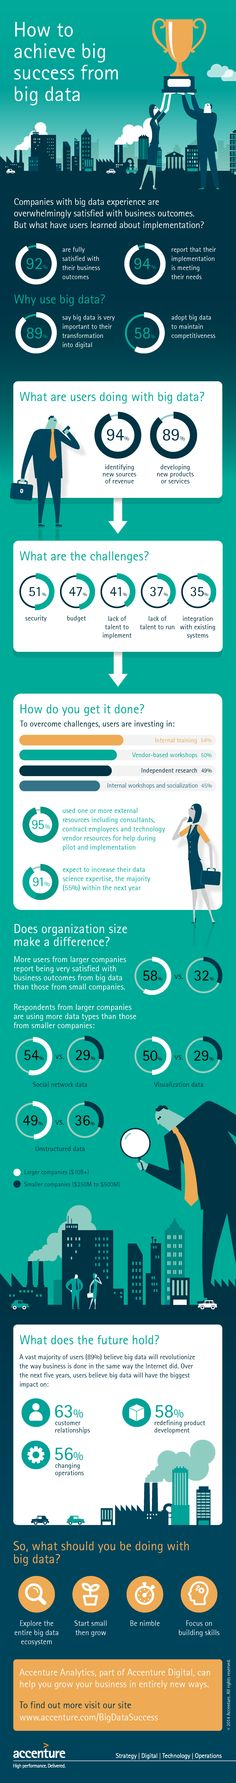 How to Achieve Big Success from Big Data - Infographic - Accenture Big Data, Online Marketing, Digital Marketing, Digital Board, Visualisation, Career Planning, Business Intelligence, Data Analytics, Cloud Computing